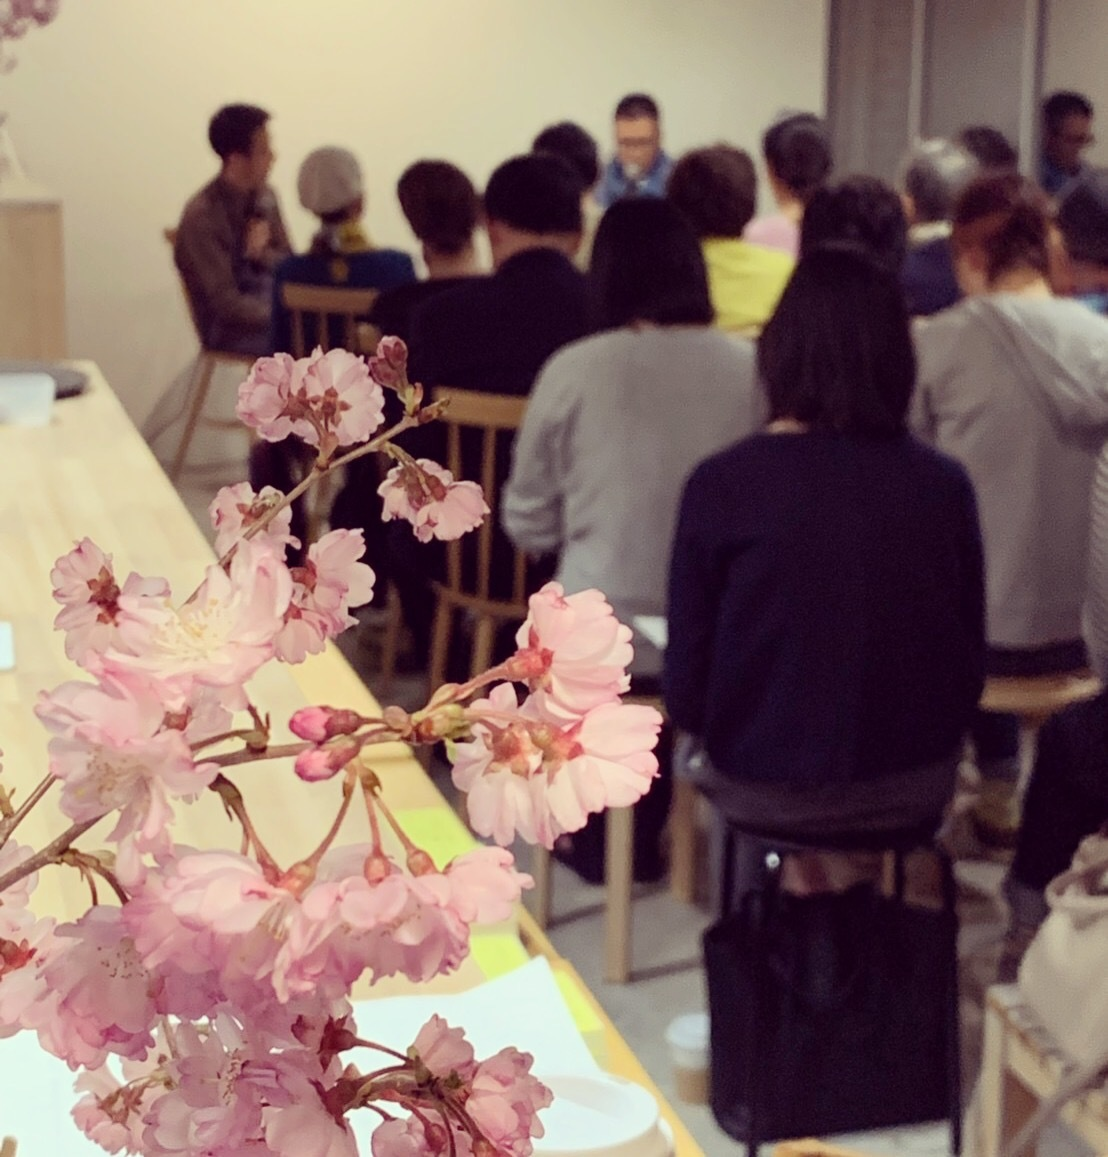 MINOU BOOKS & CAFE にて 「こどもとことば」が開催されました。_d0116009_08081666.jpg